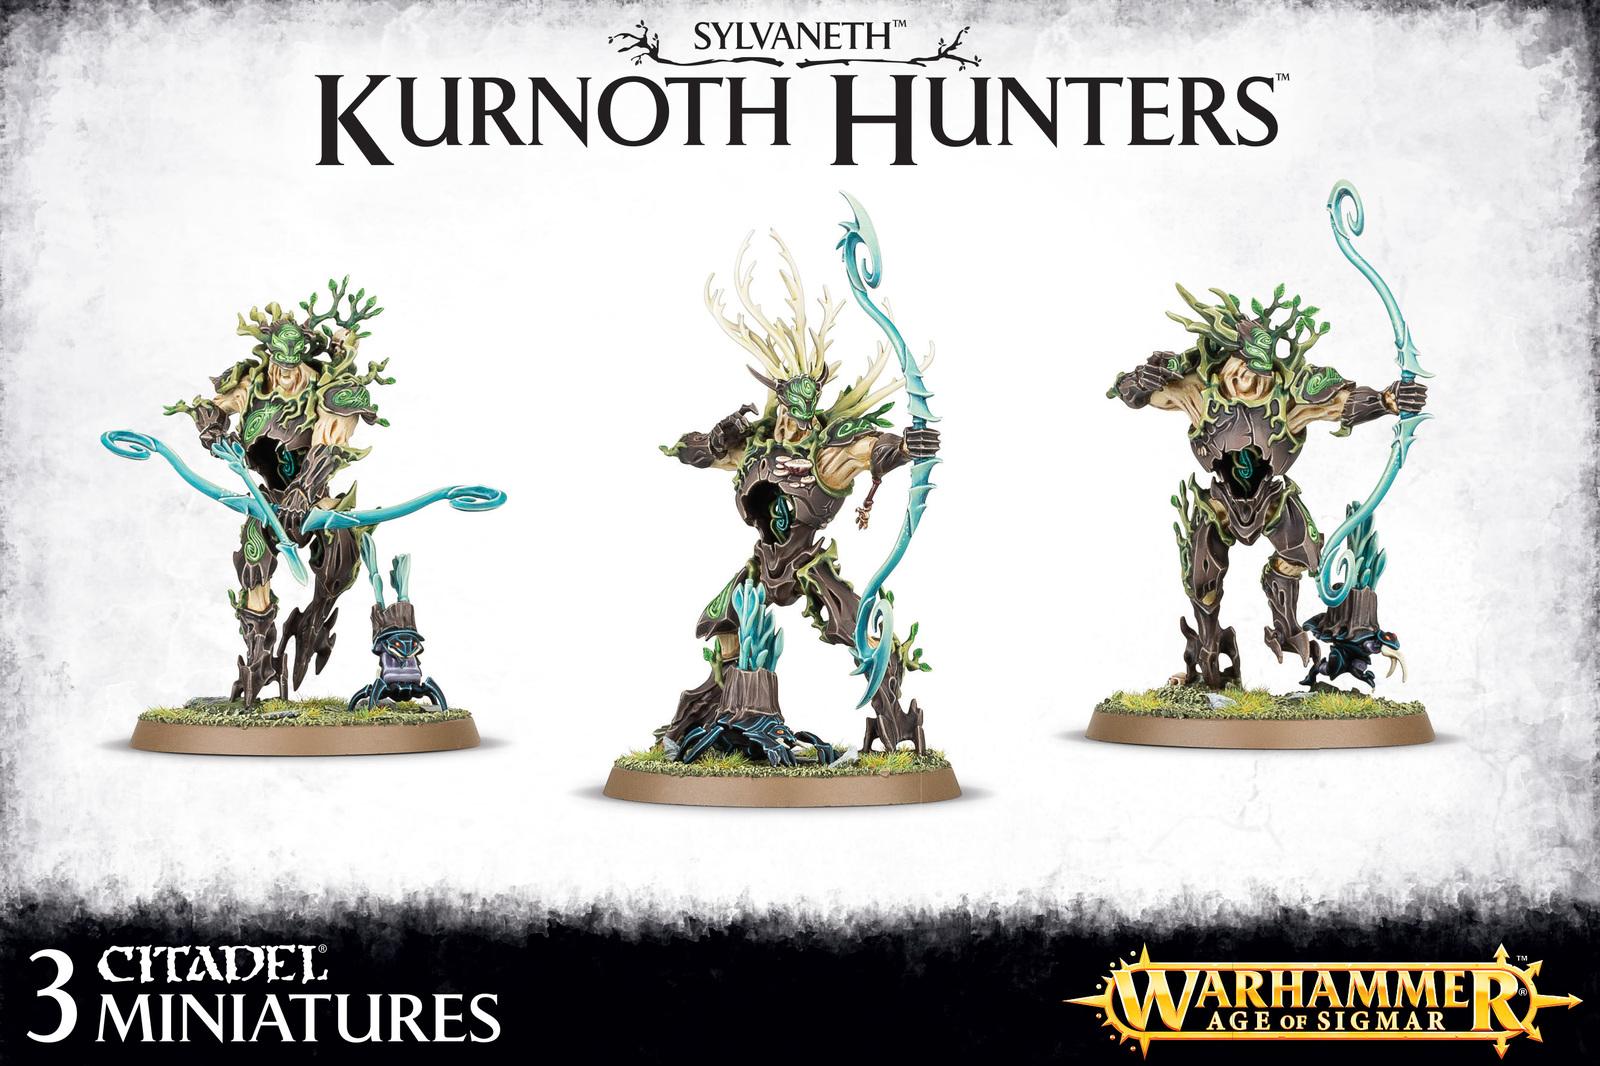 Sylvaneth - Kurnoth Hunters image